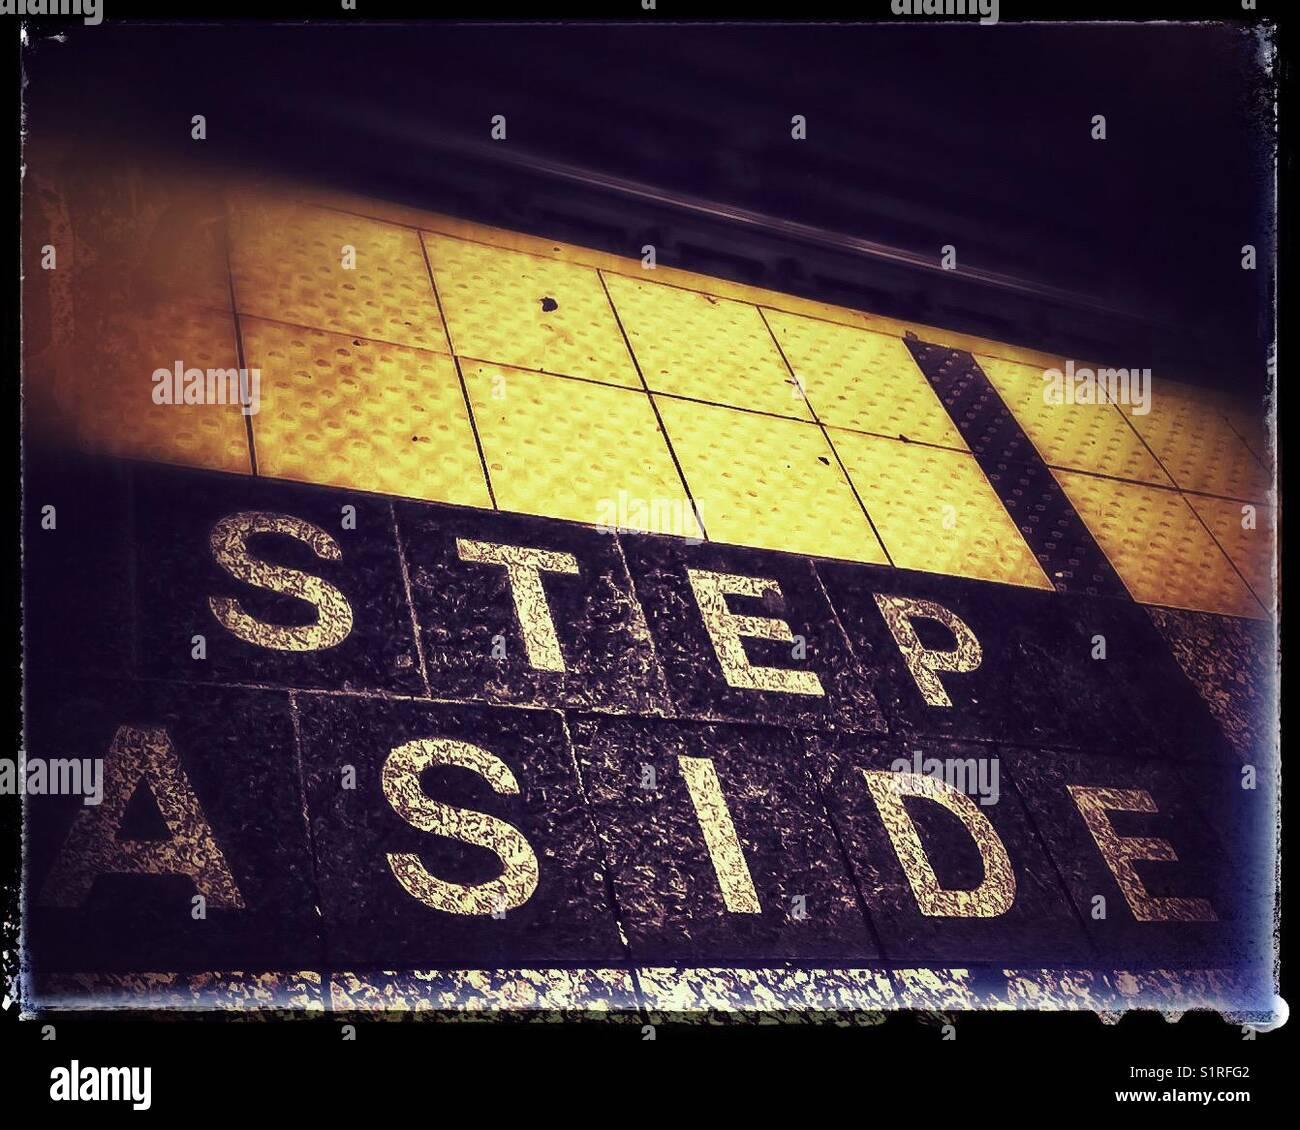 Step Aside written on subway platform - Stock Image